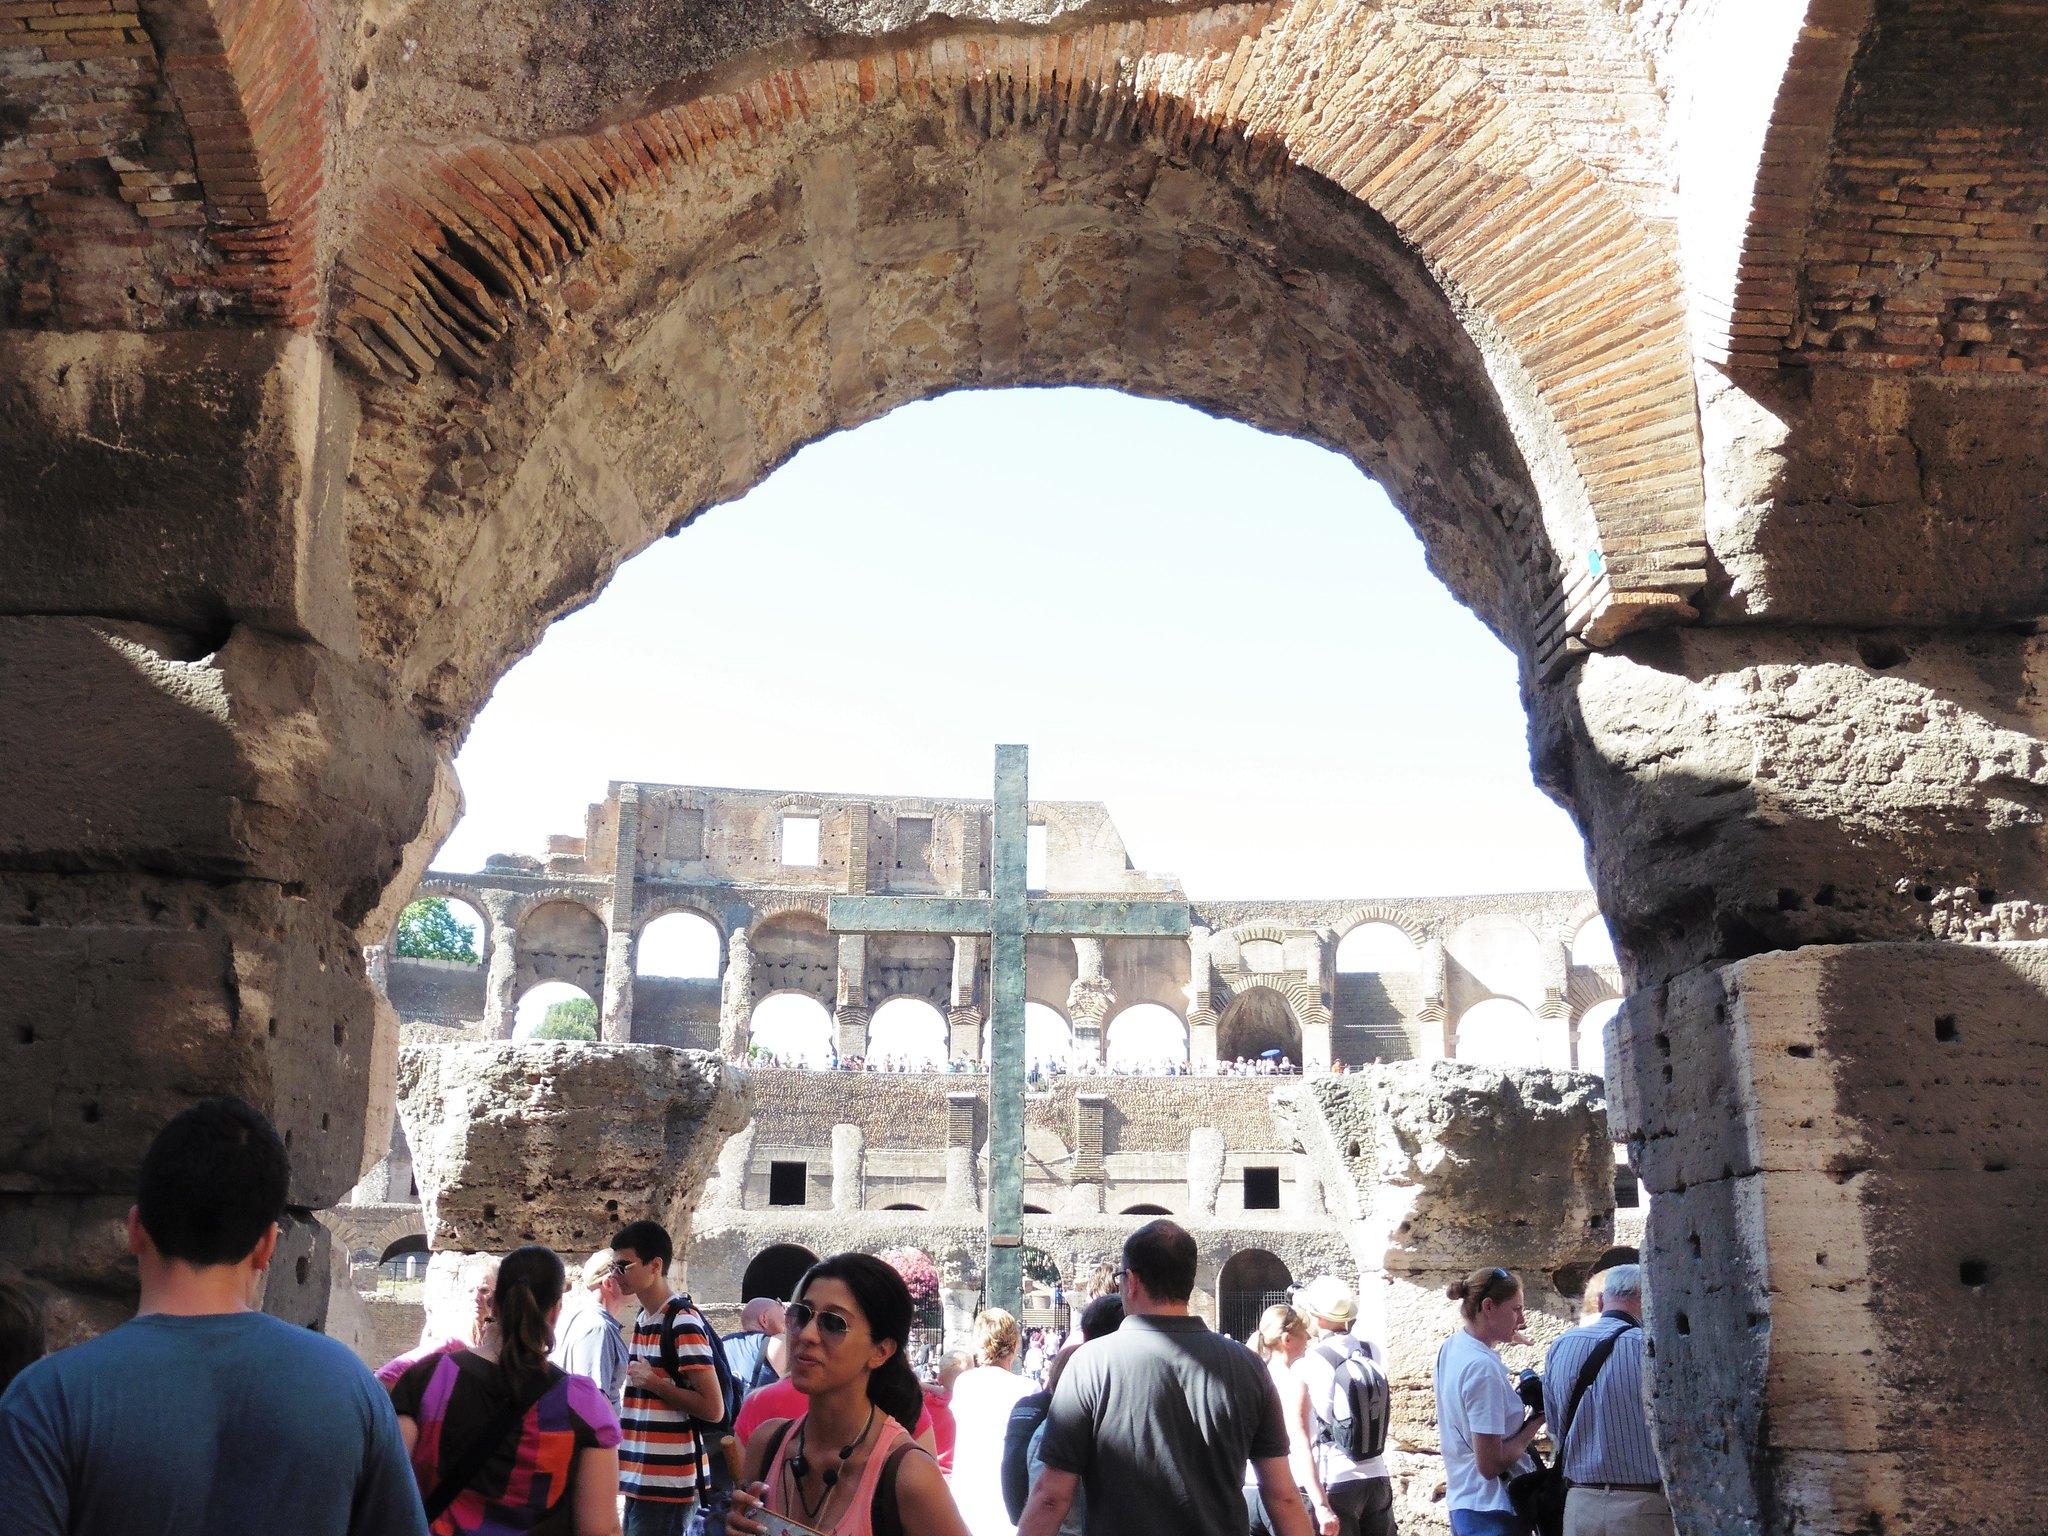 Cross in Roman Colosseum